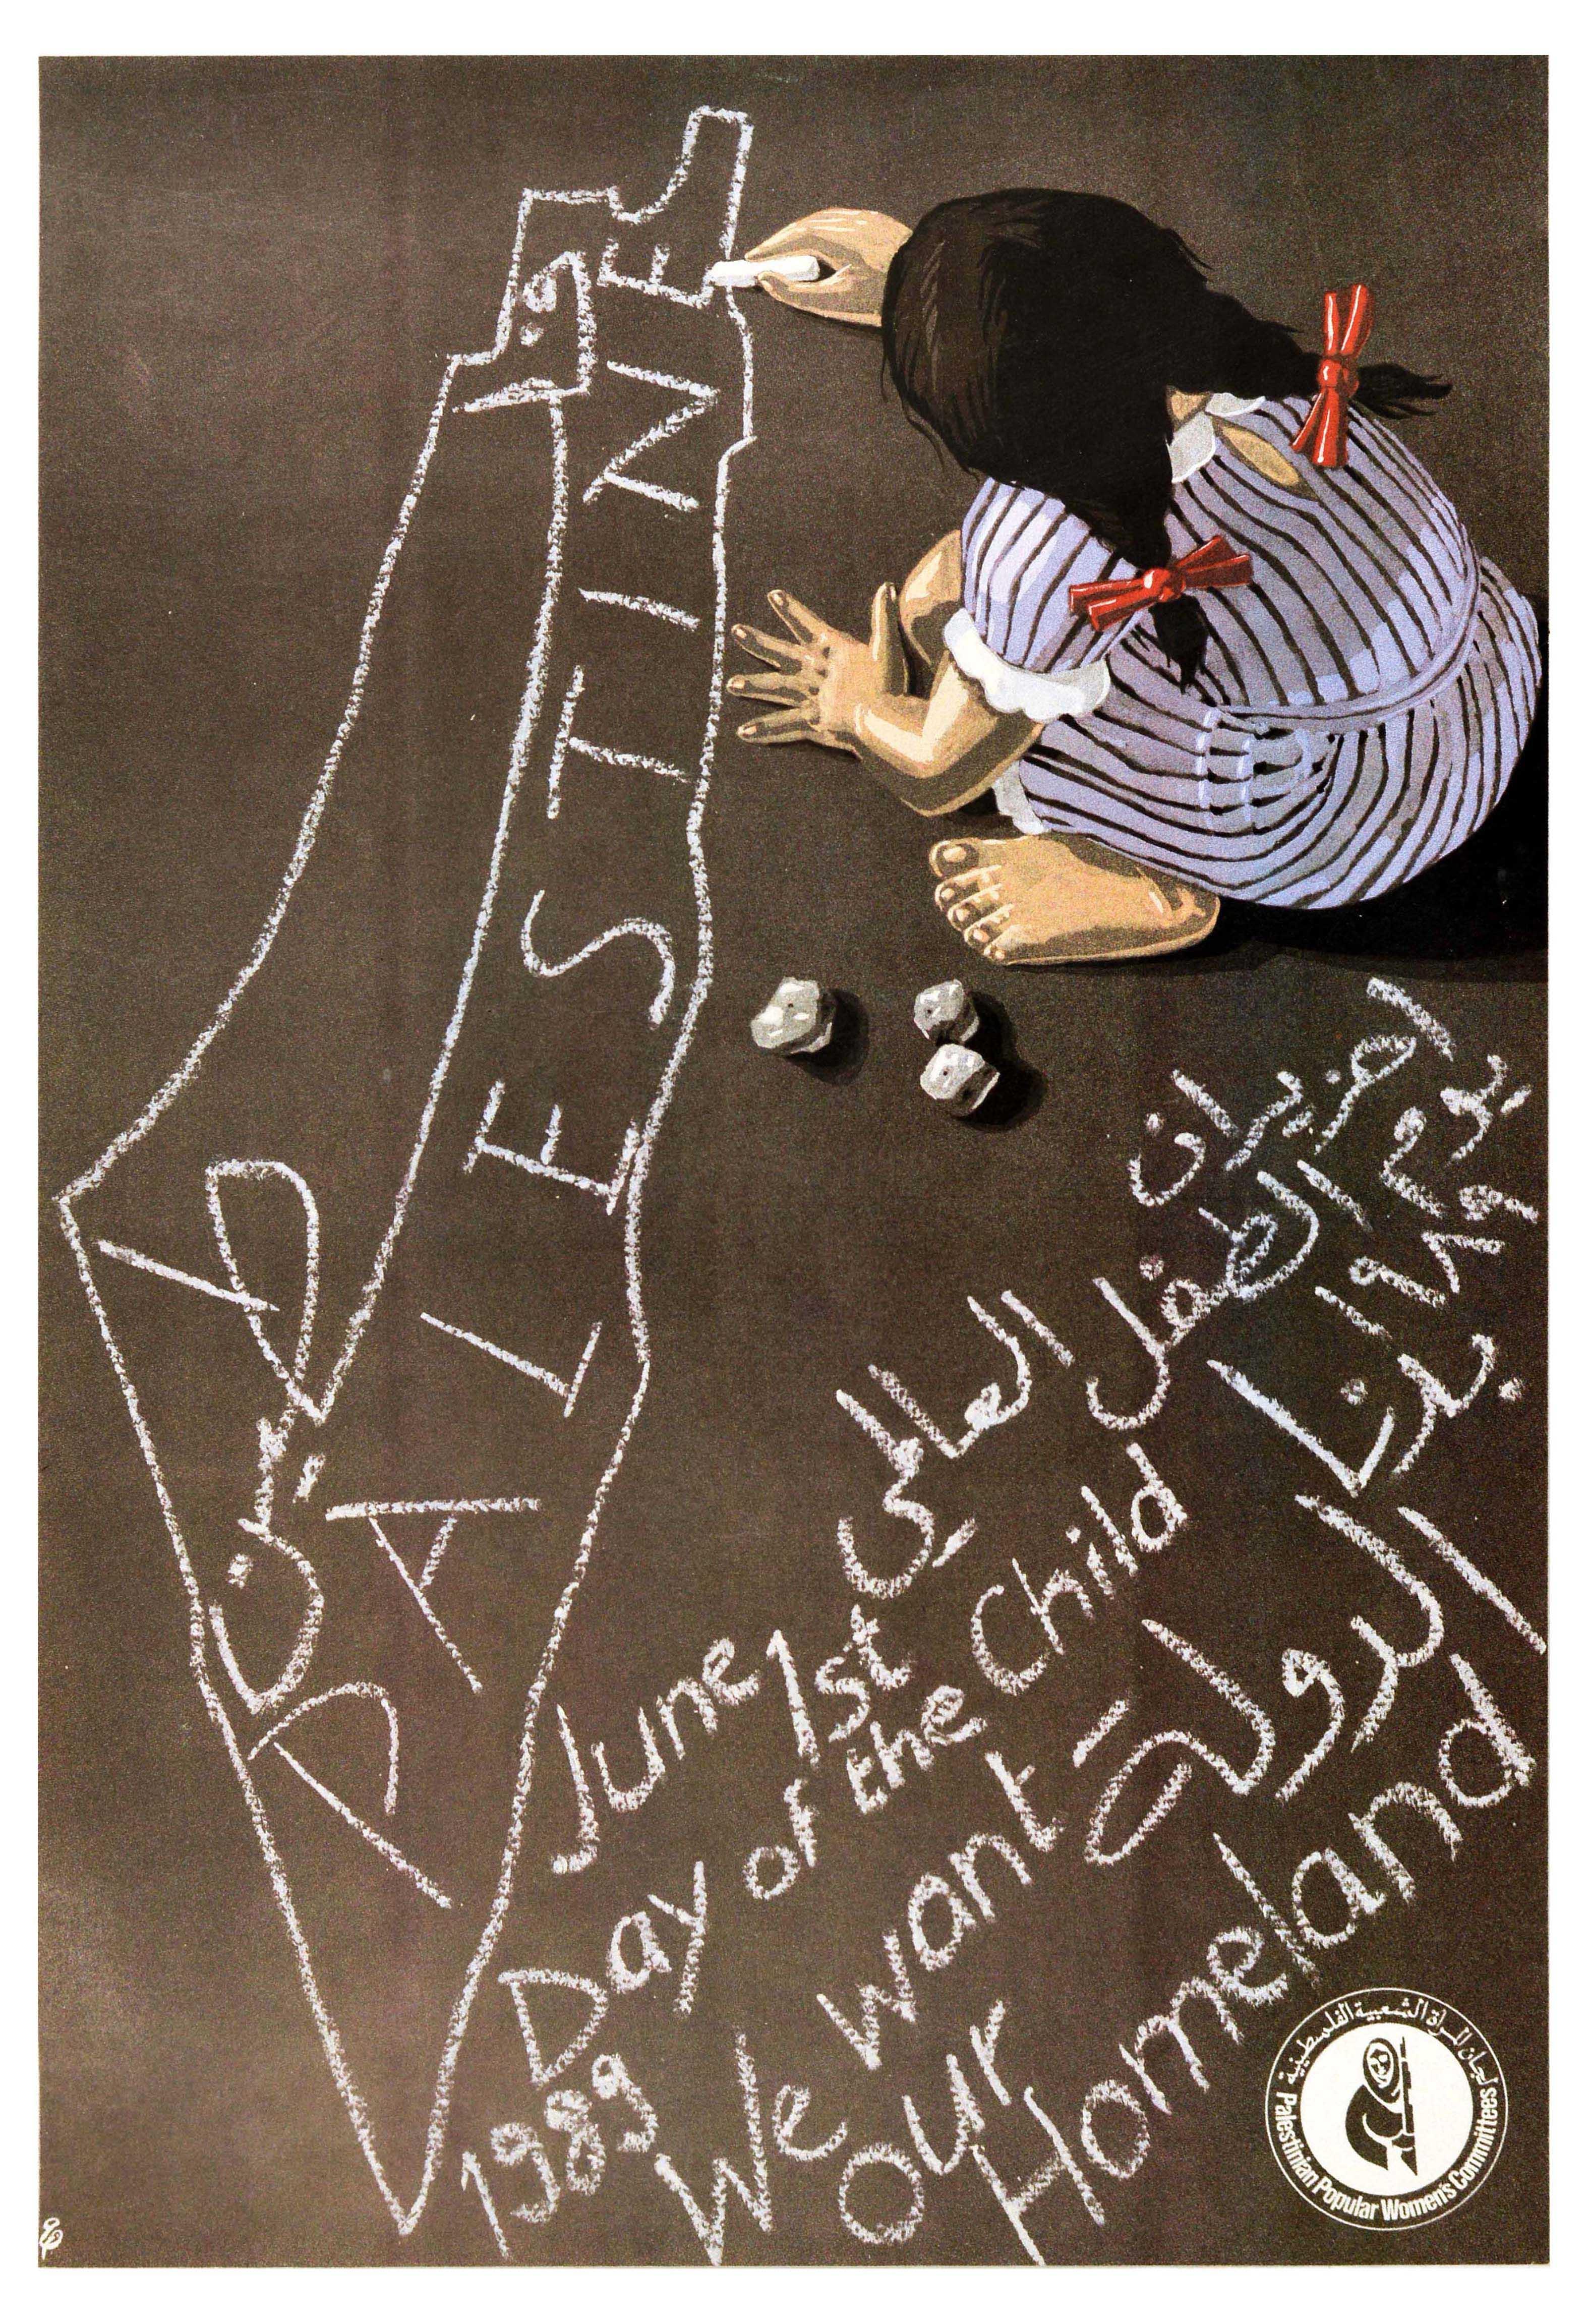 Propaganda Poster Palestine Children We Want Our Homeland